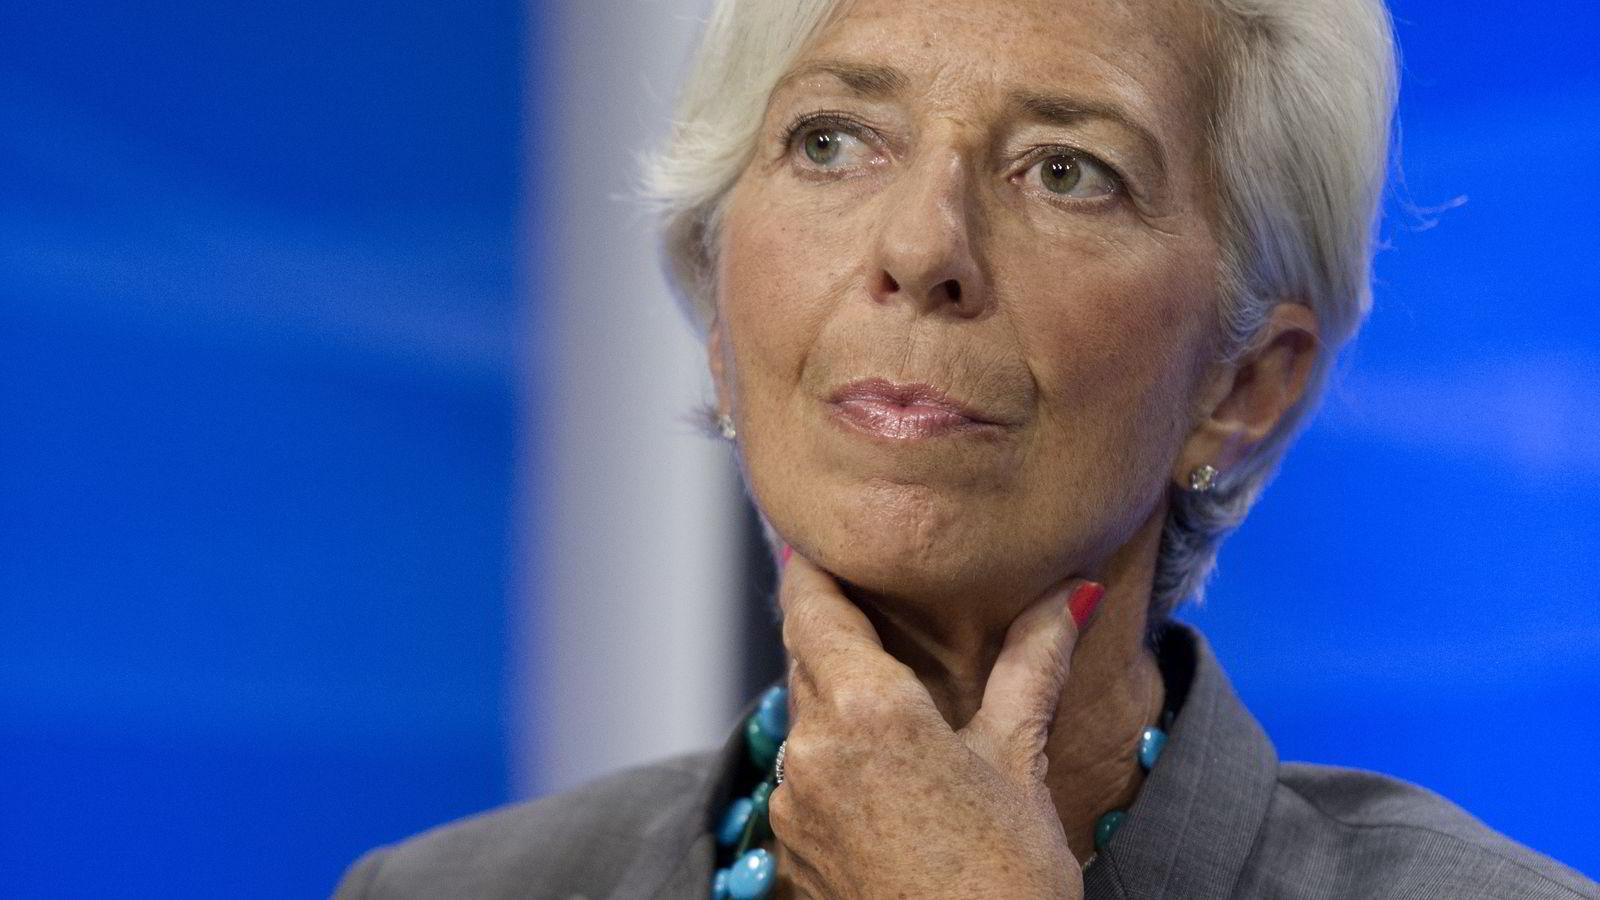 IMF-sjef Christine Lagarde. Illustrasjonsfoto: AP Photo/Cliff Owen